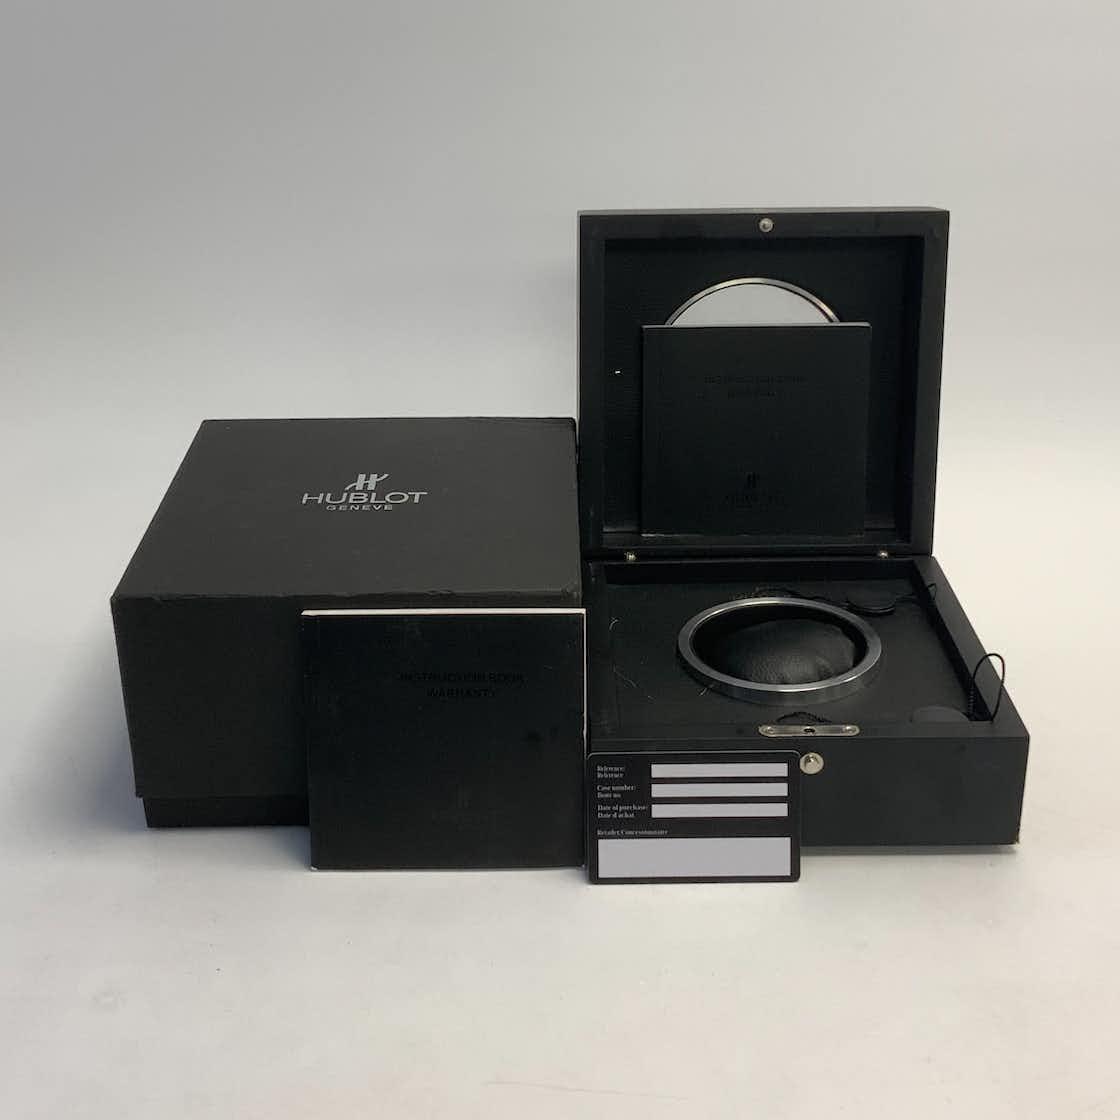 Hublot King Power F1 Limited Edition 703.CI.1123.NR.FM010